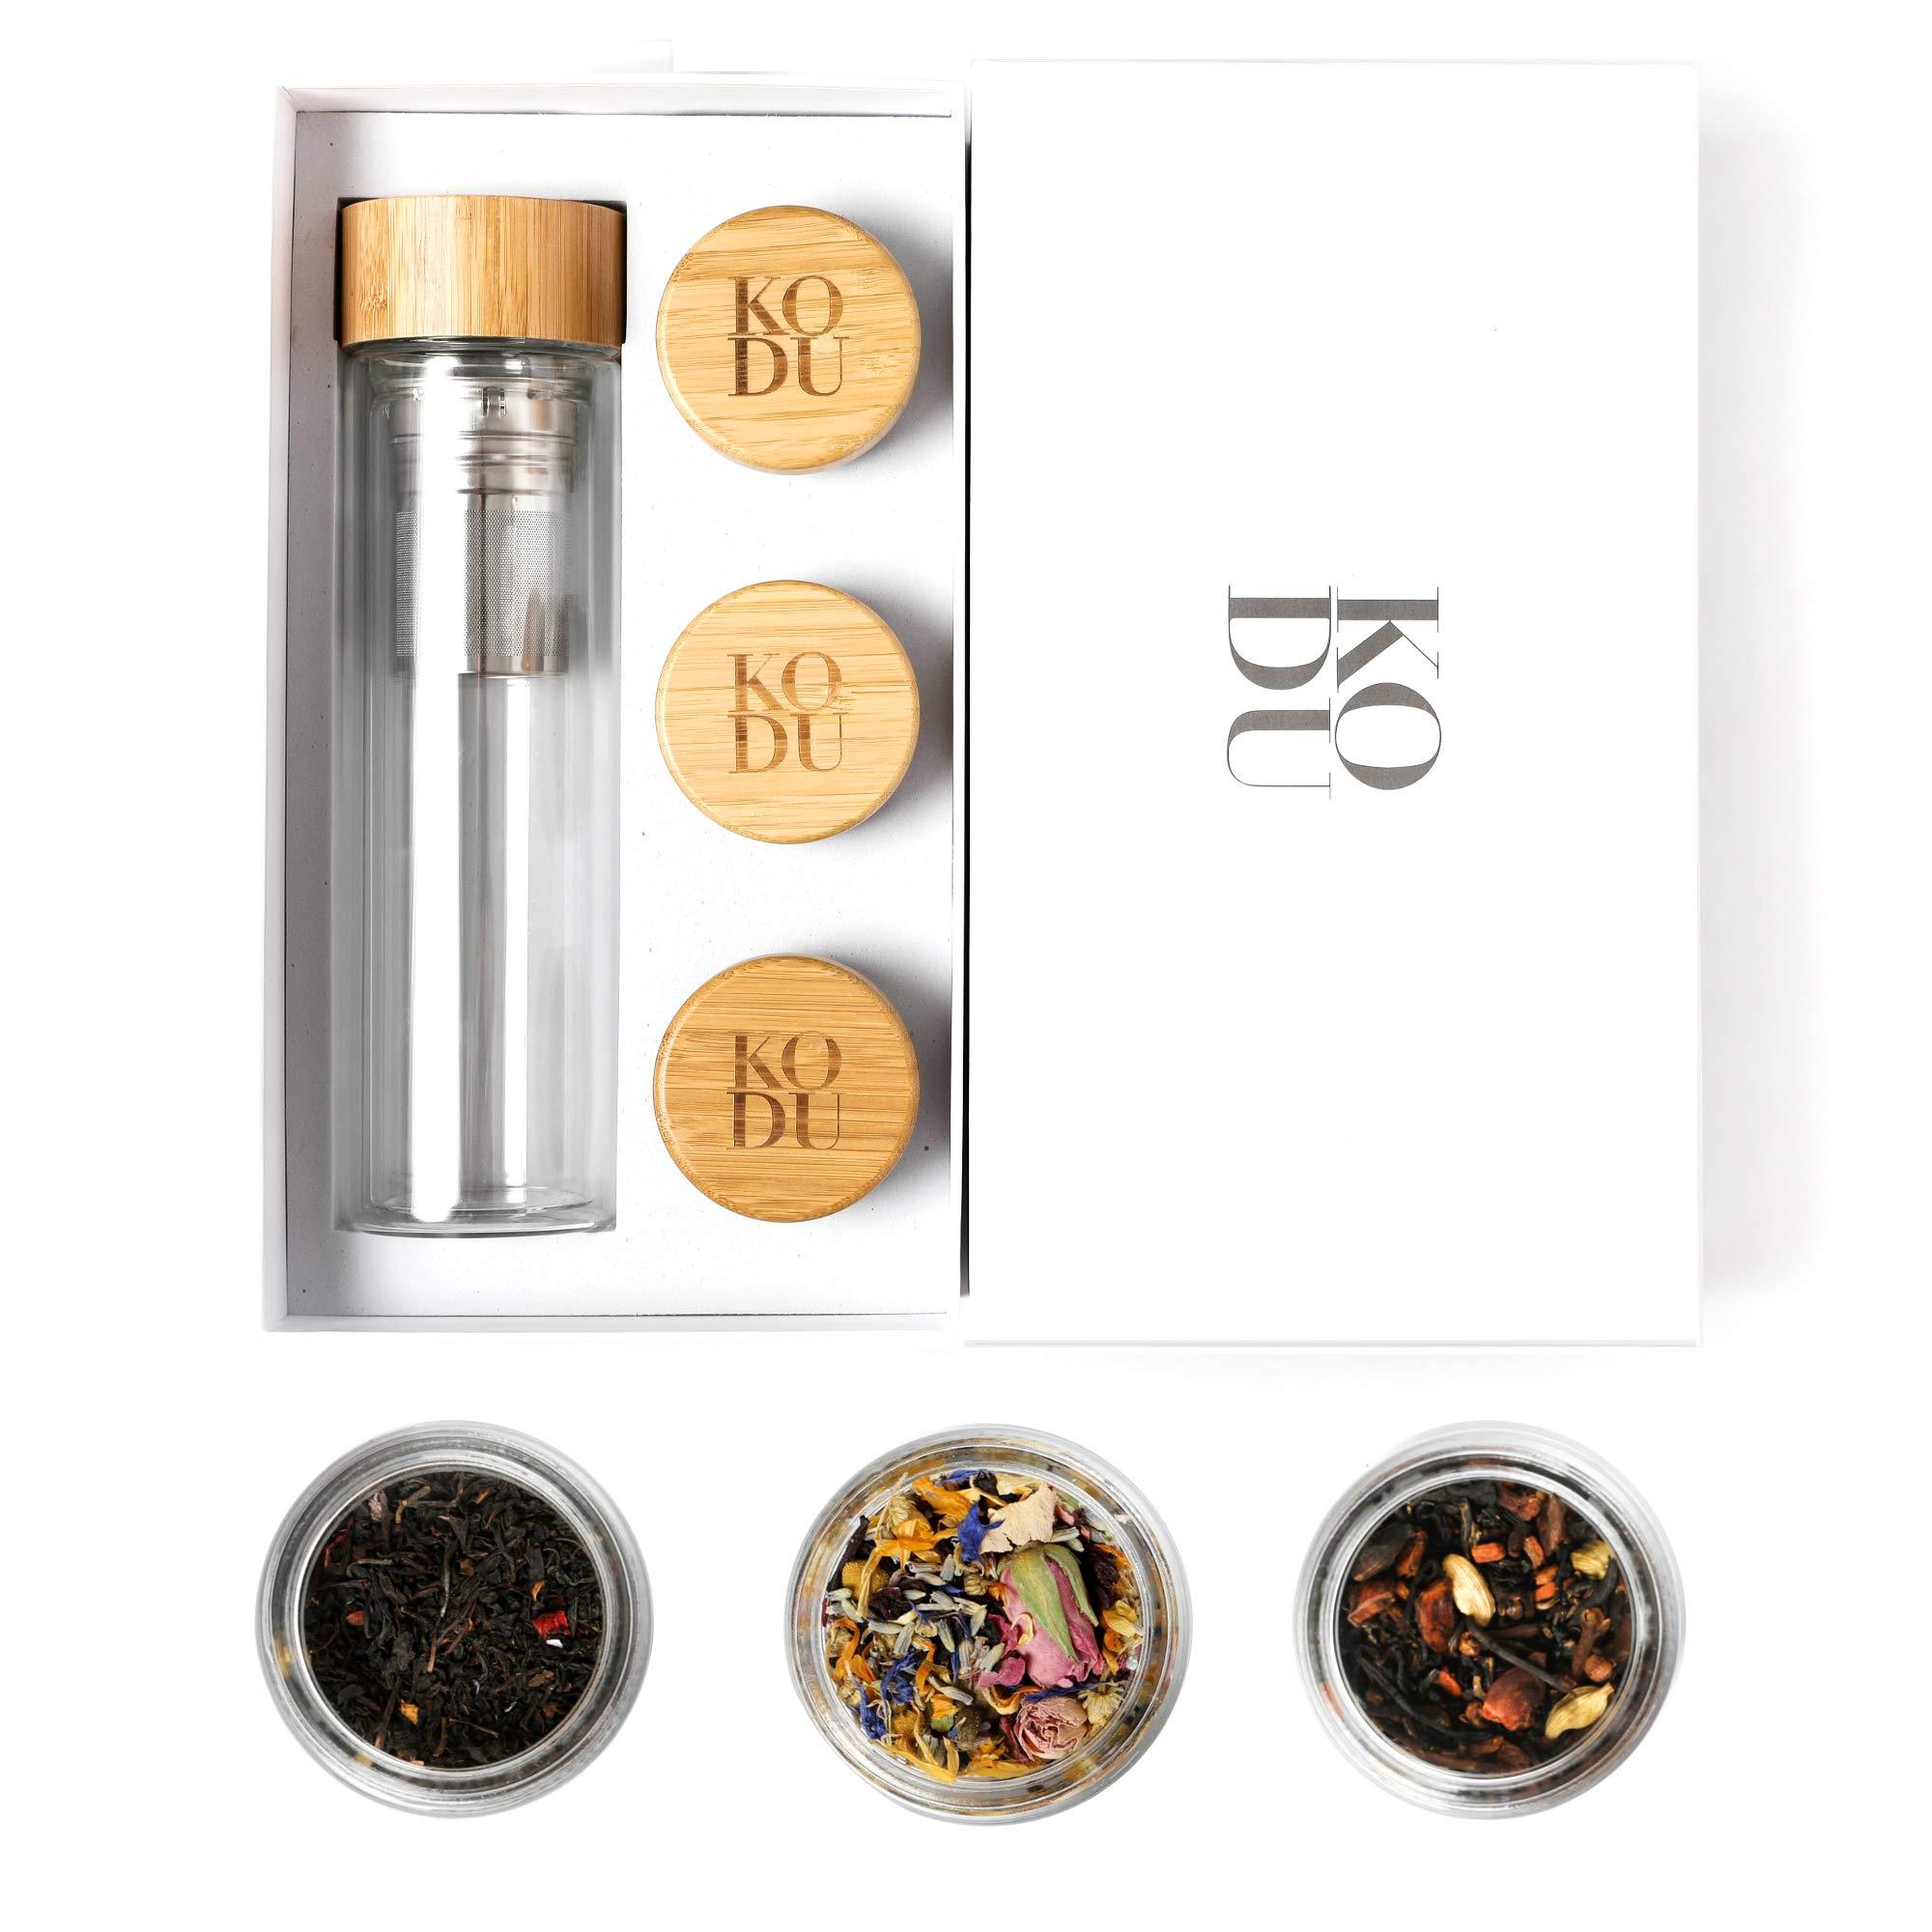 Kodu Loose Leaf Tea Infuser Bottle & Tea Sampler, YouBeauTea Gift Box for Tea Lovers